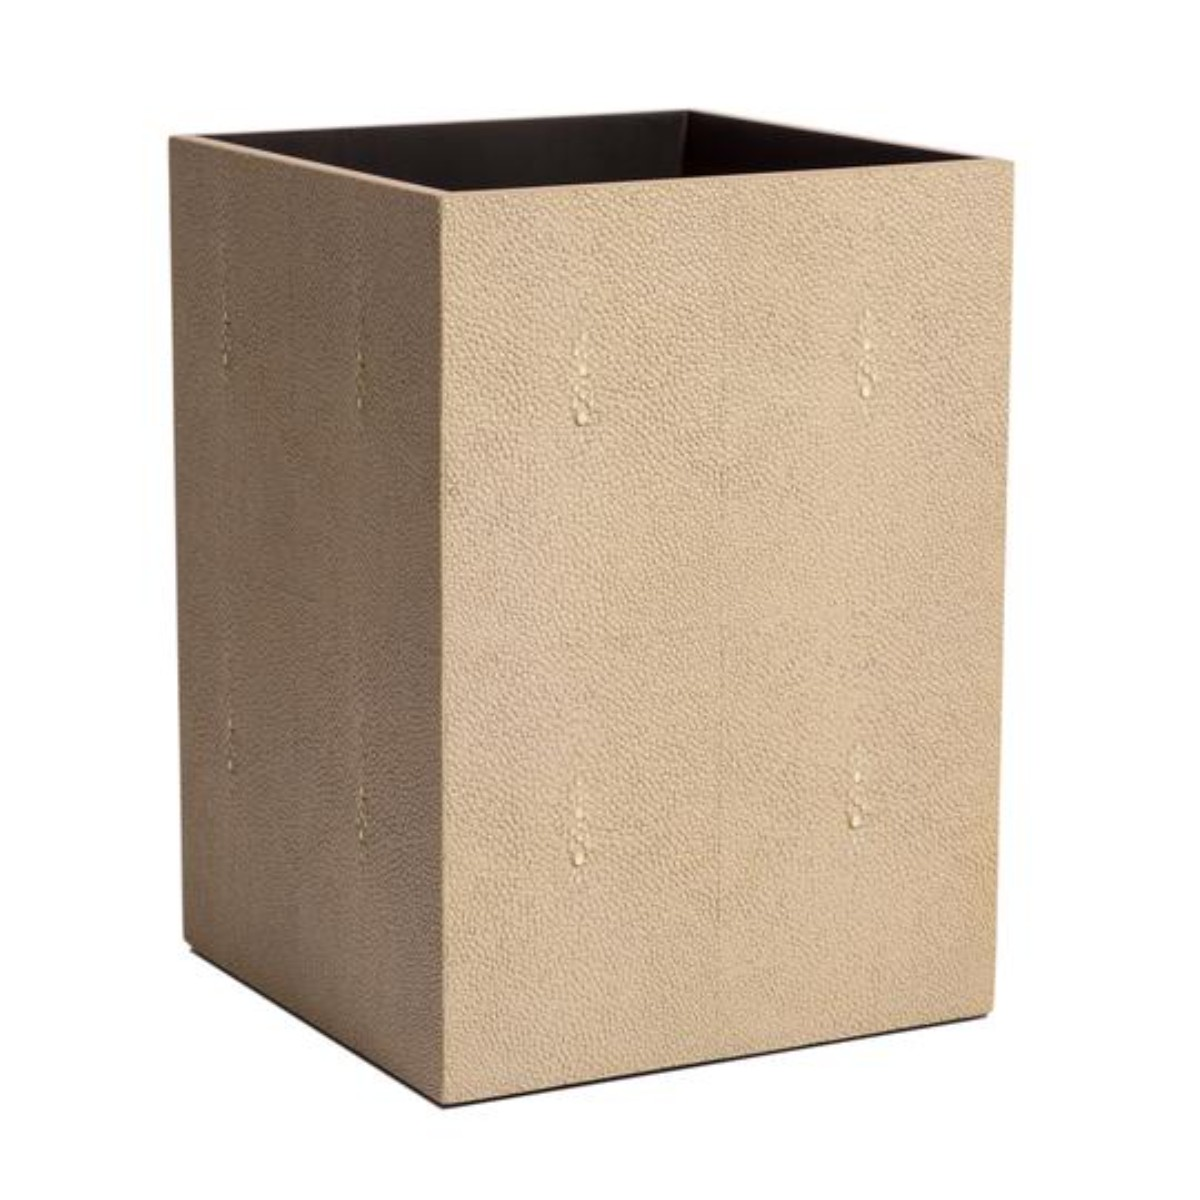 Posh Trading I Chelsea Waste Paper Basket | Faux Shagreen Natural